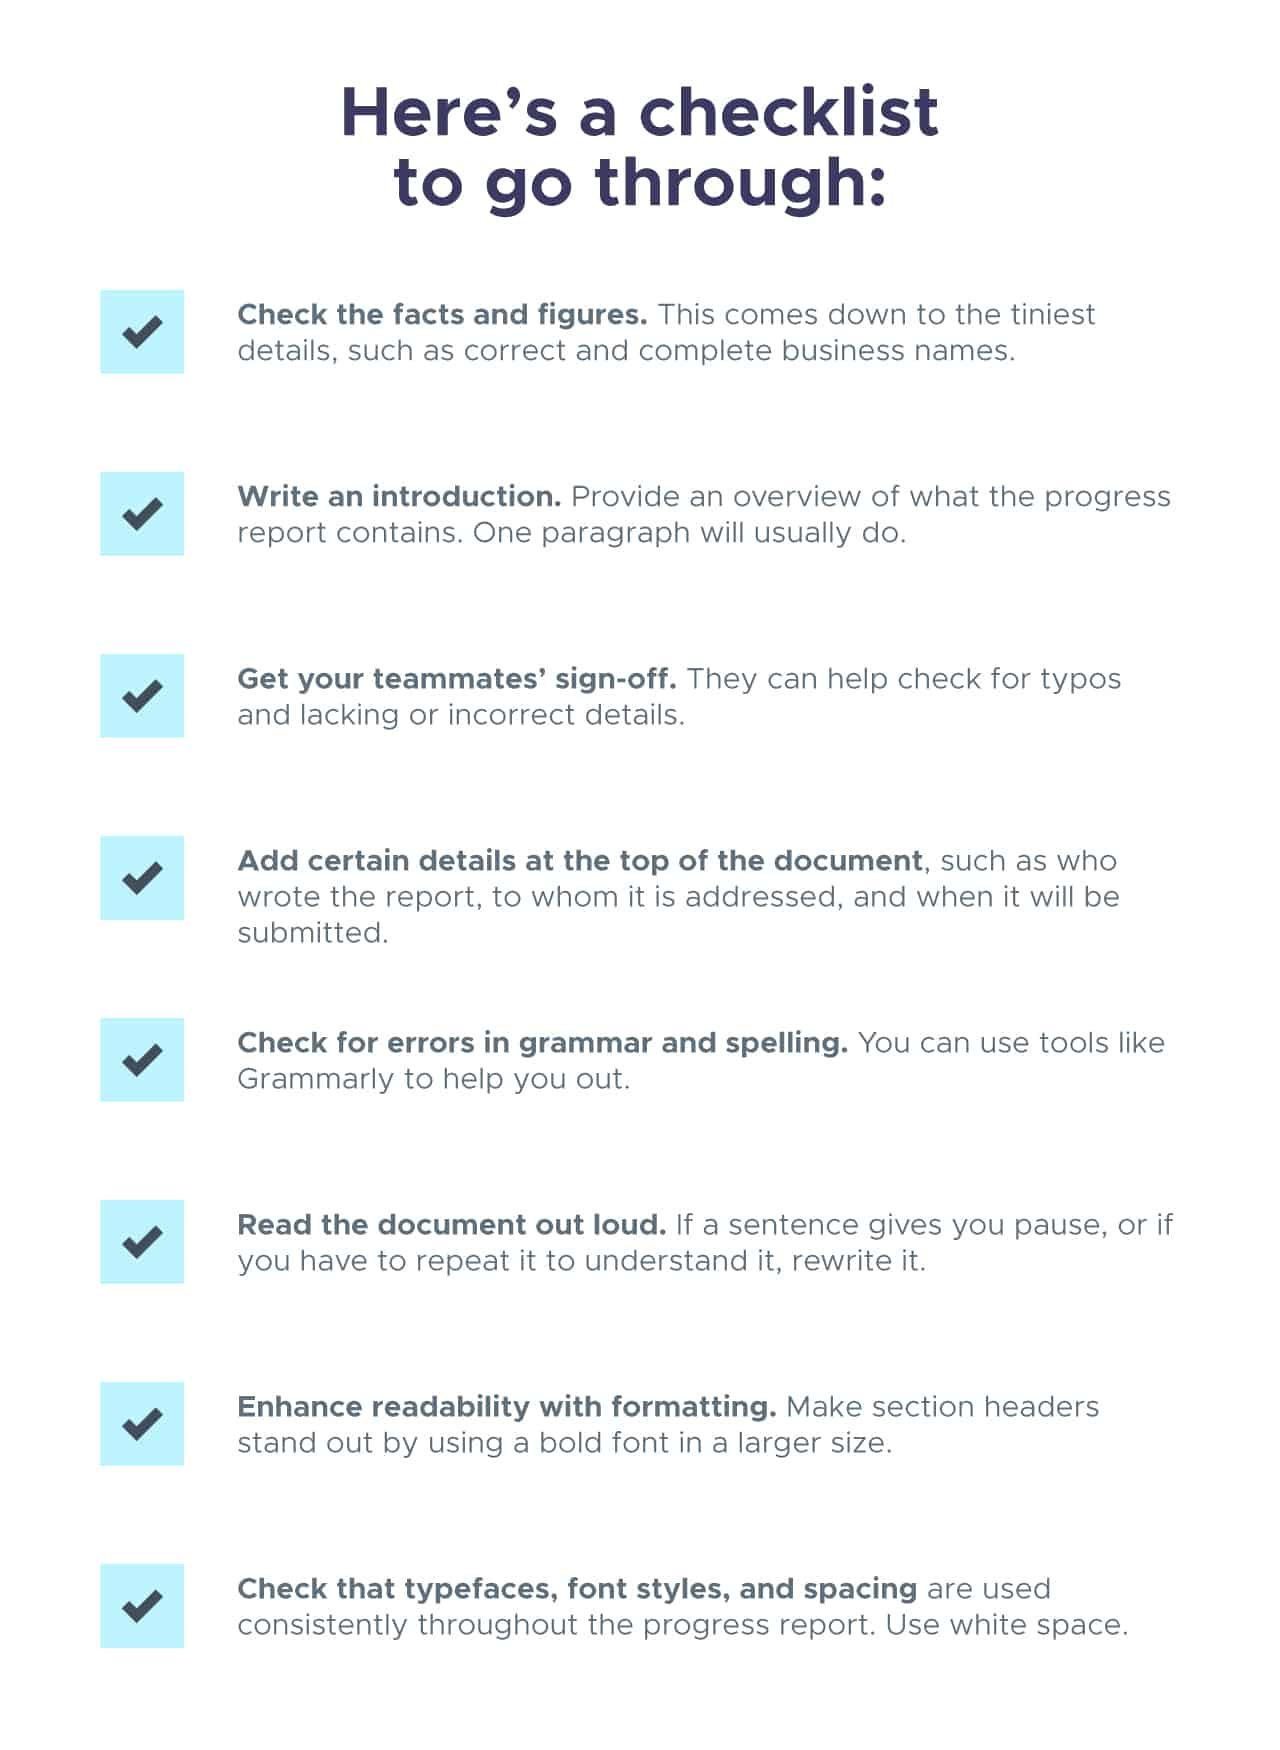 progress-report-checklist-8549520